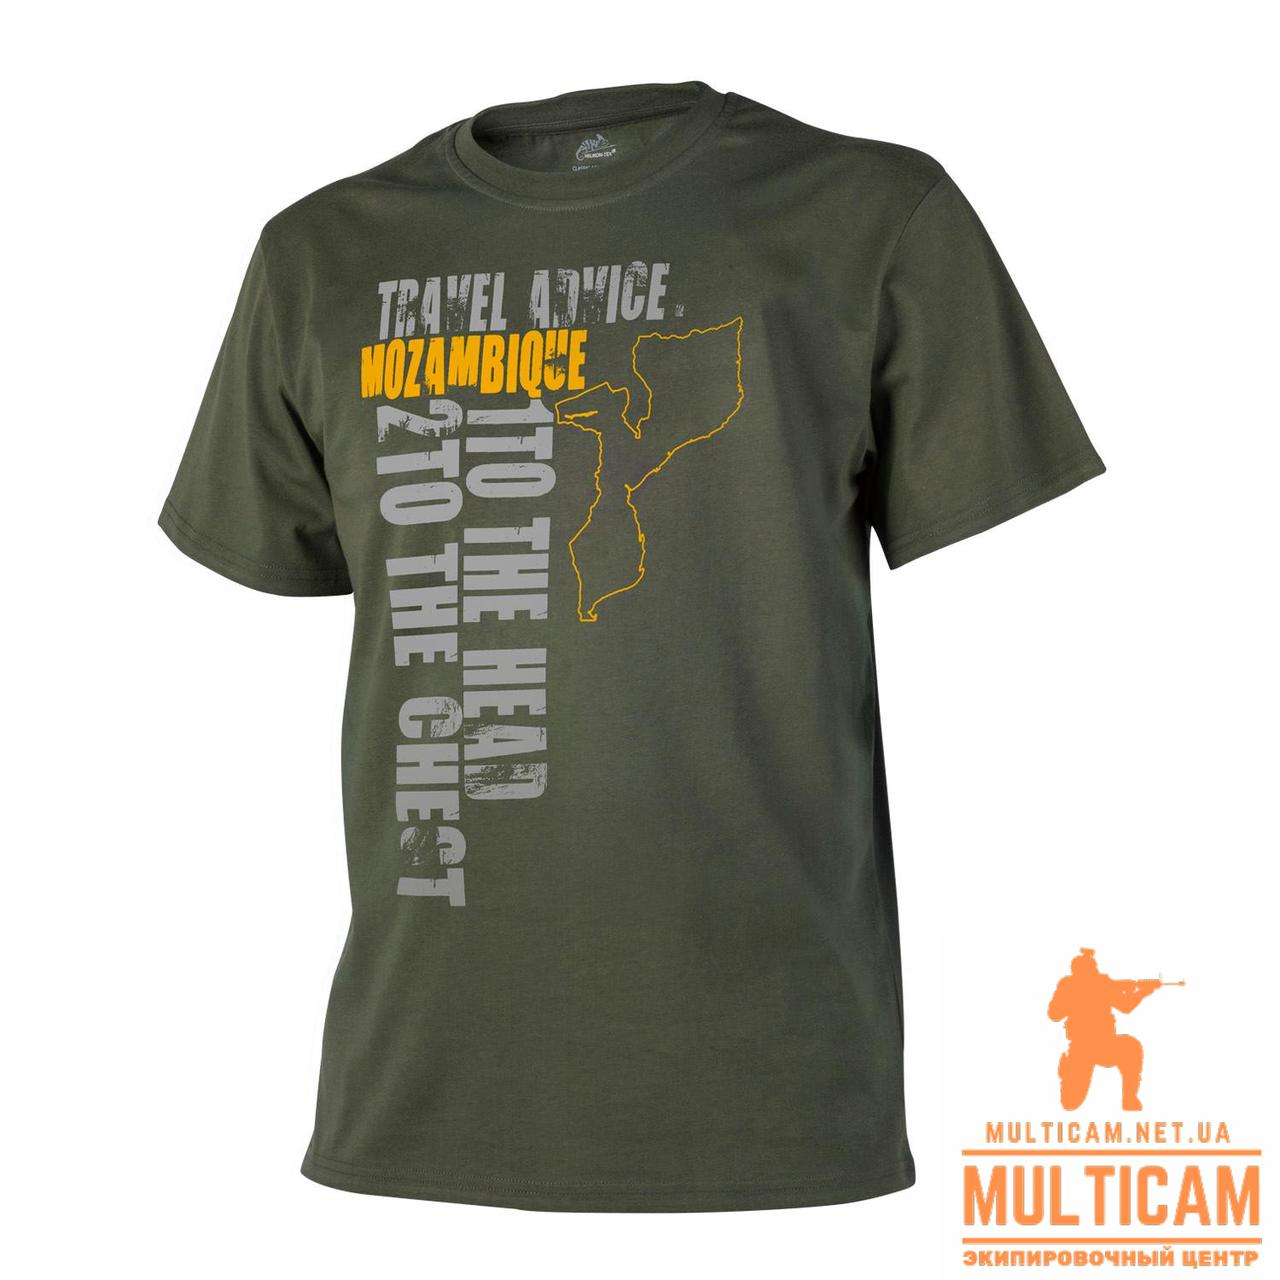 Футболка Helikon-Tex® T-Shirt (Travel Advice: Mozambique) - Cotton - Olive Green